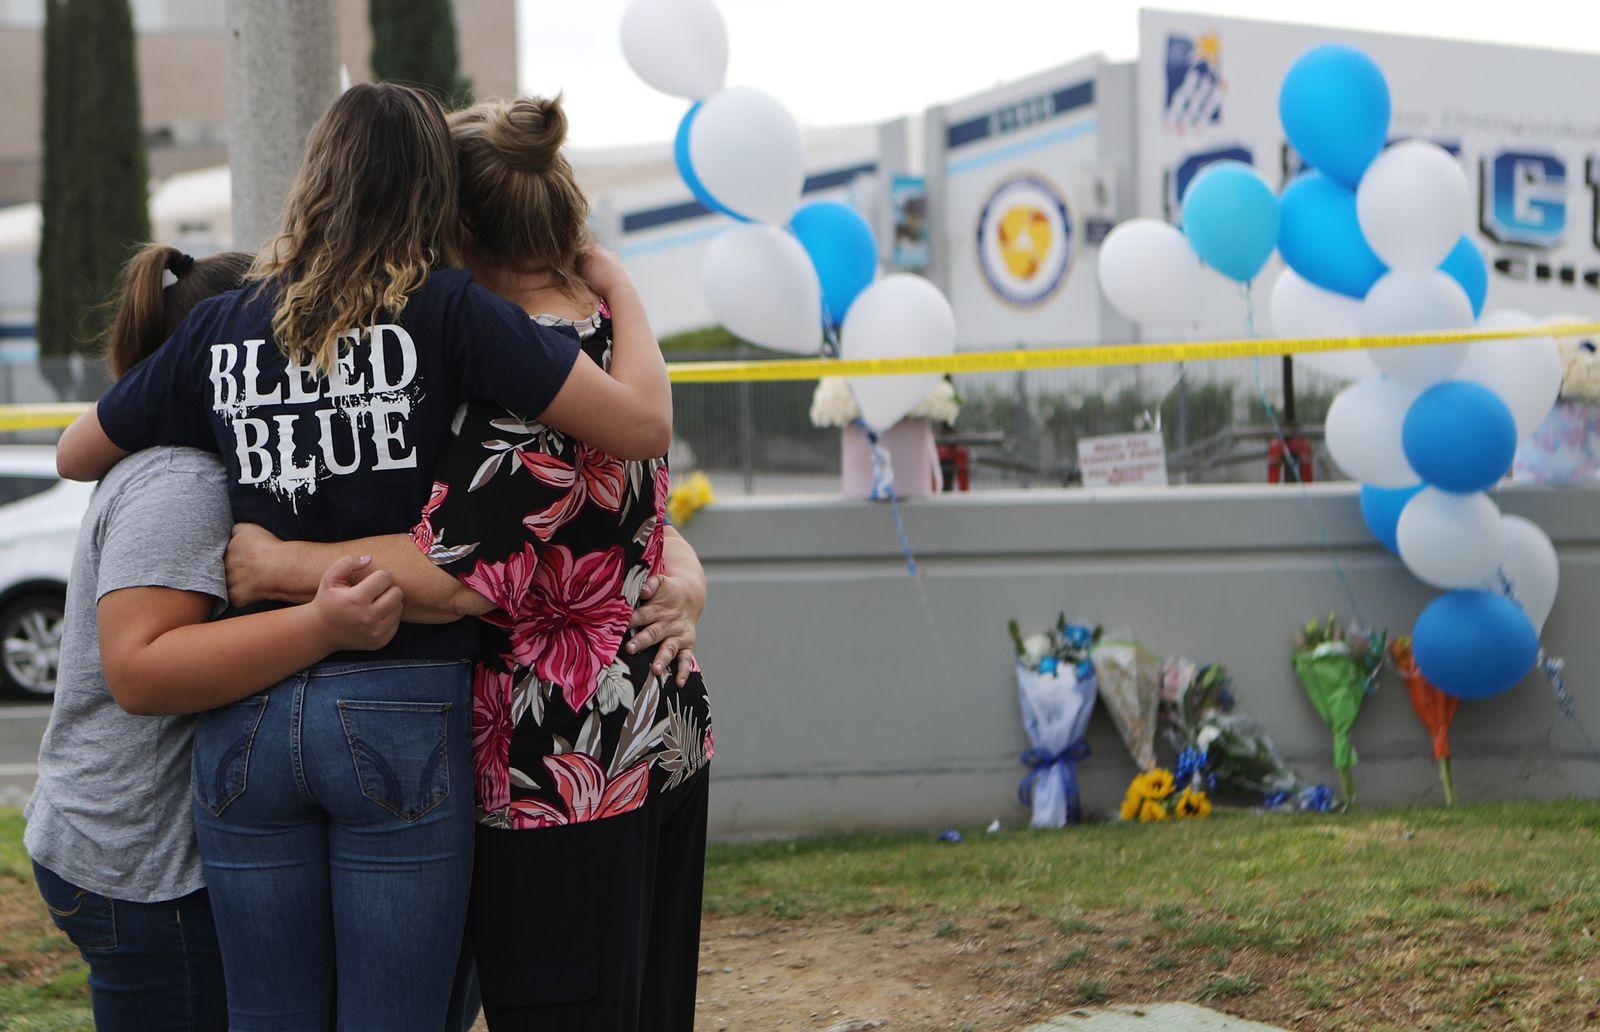 US-TWO-KILLED-IN-SCHOOL-SHOOTING-IN-SANTA-CLARITA,-CALIFORNIA